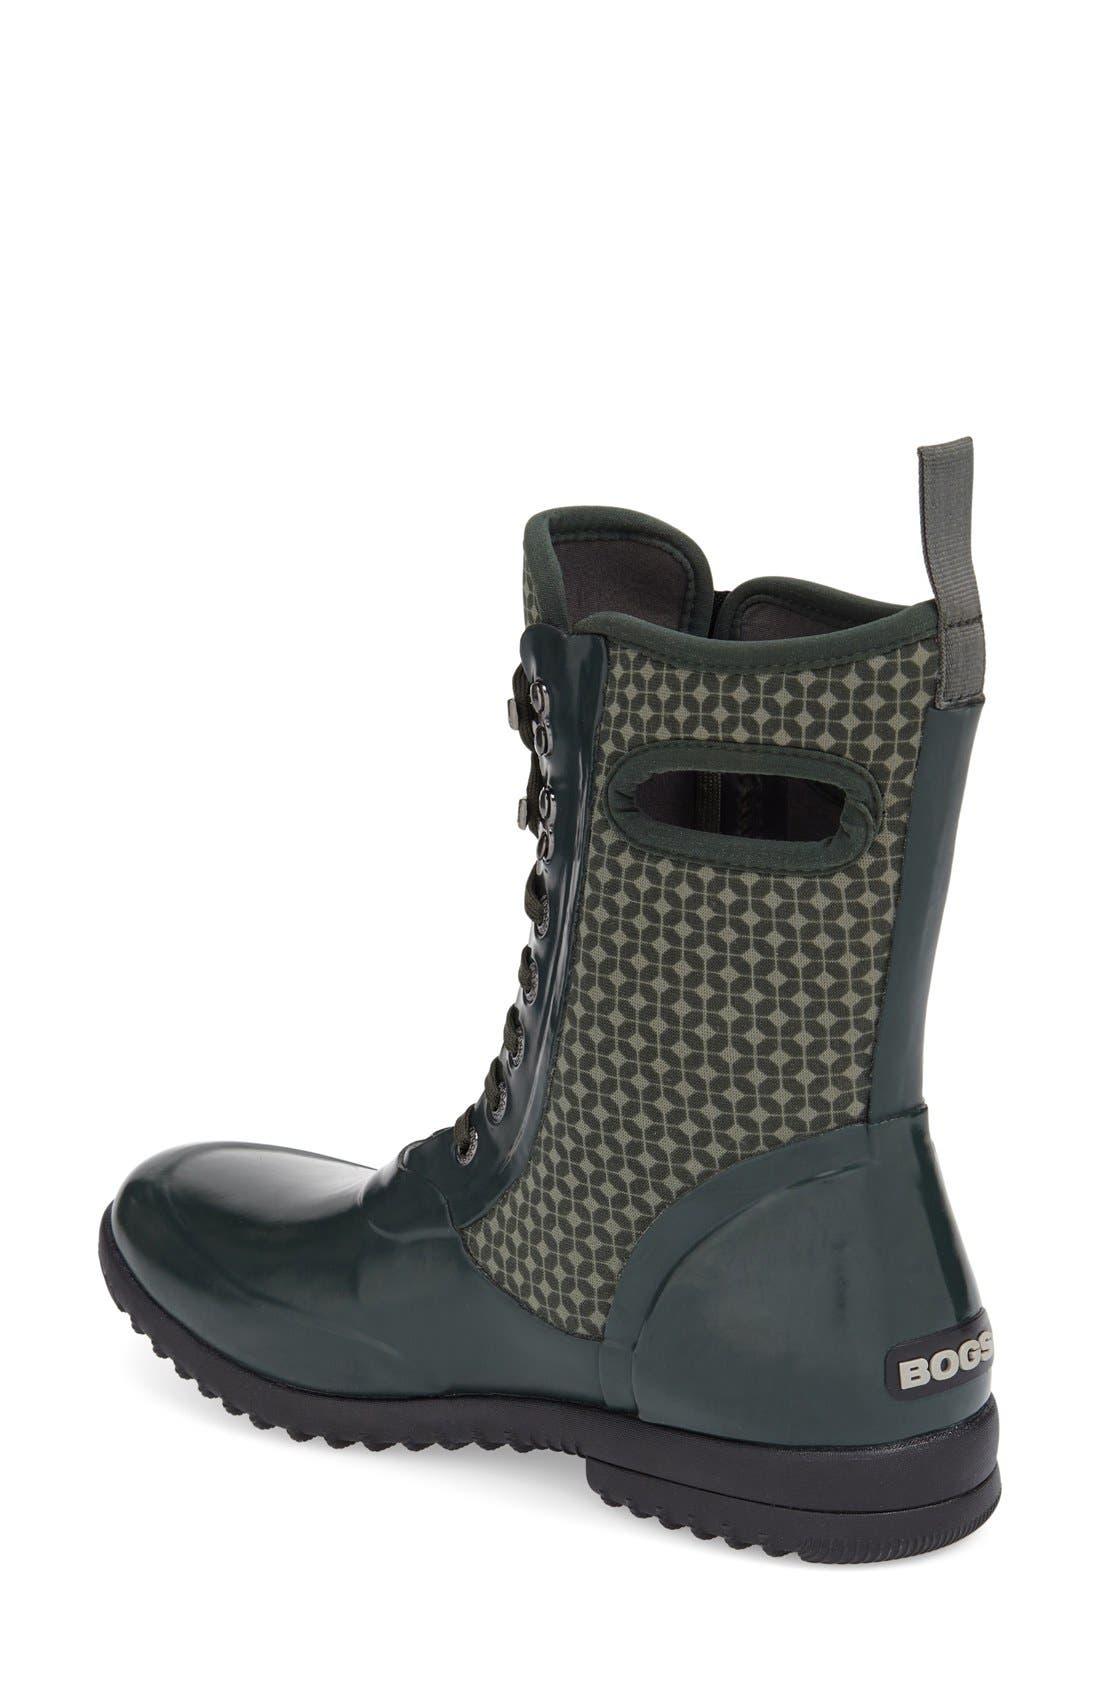 Alternate Image 2  - Bogs 'Sidney Cravat' Lace-Up Waterproof Boot (Women)